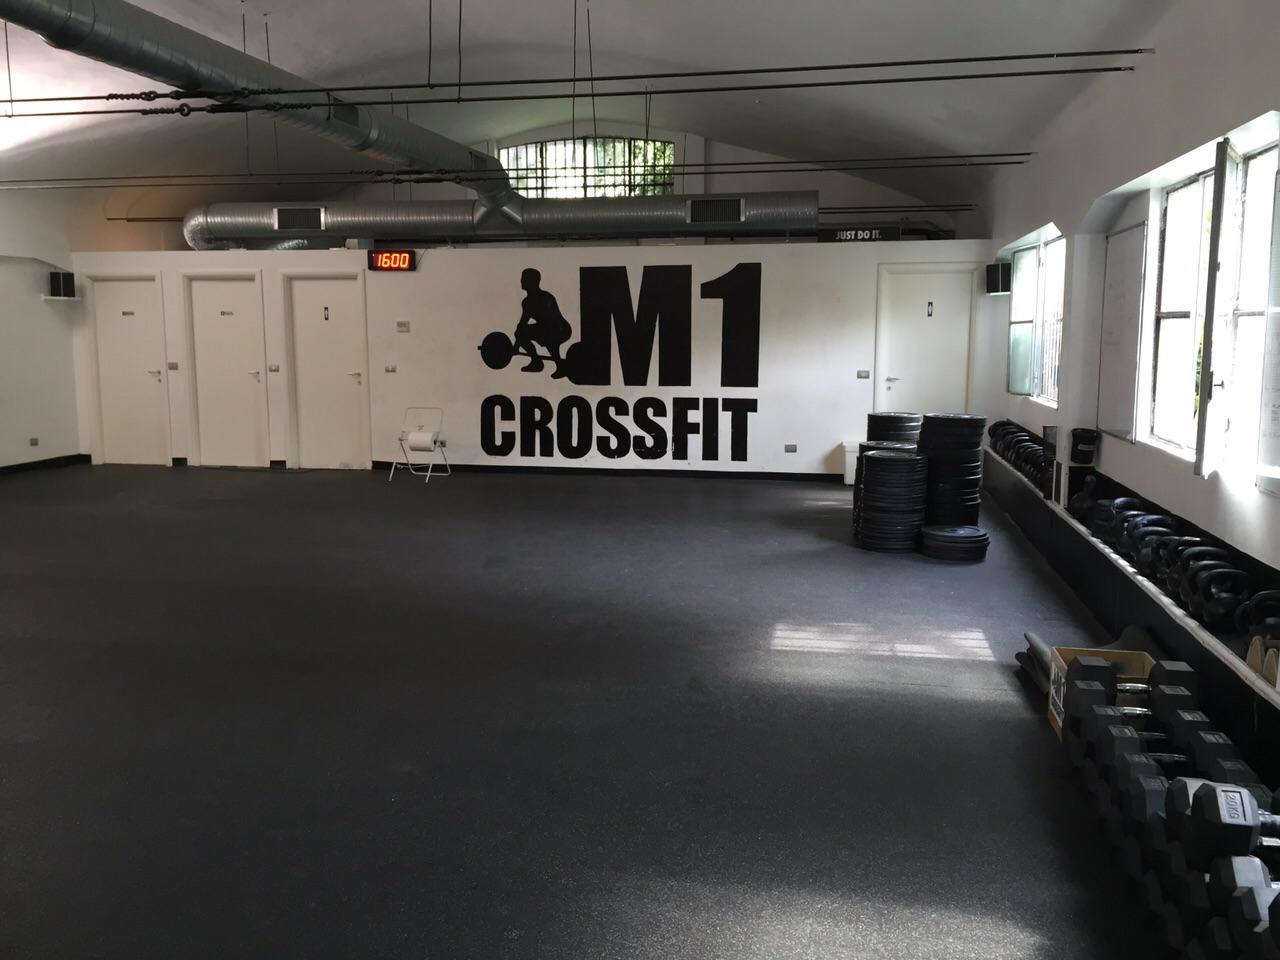 Offerta centro crossfit m1 milano for Burgo milano